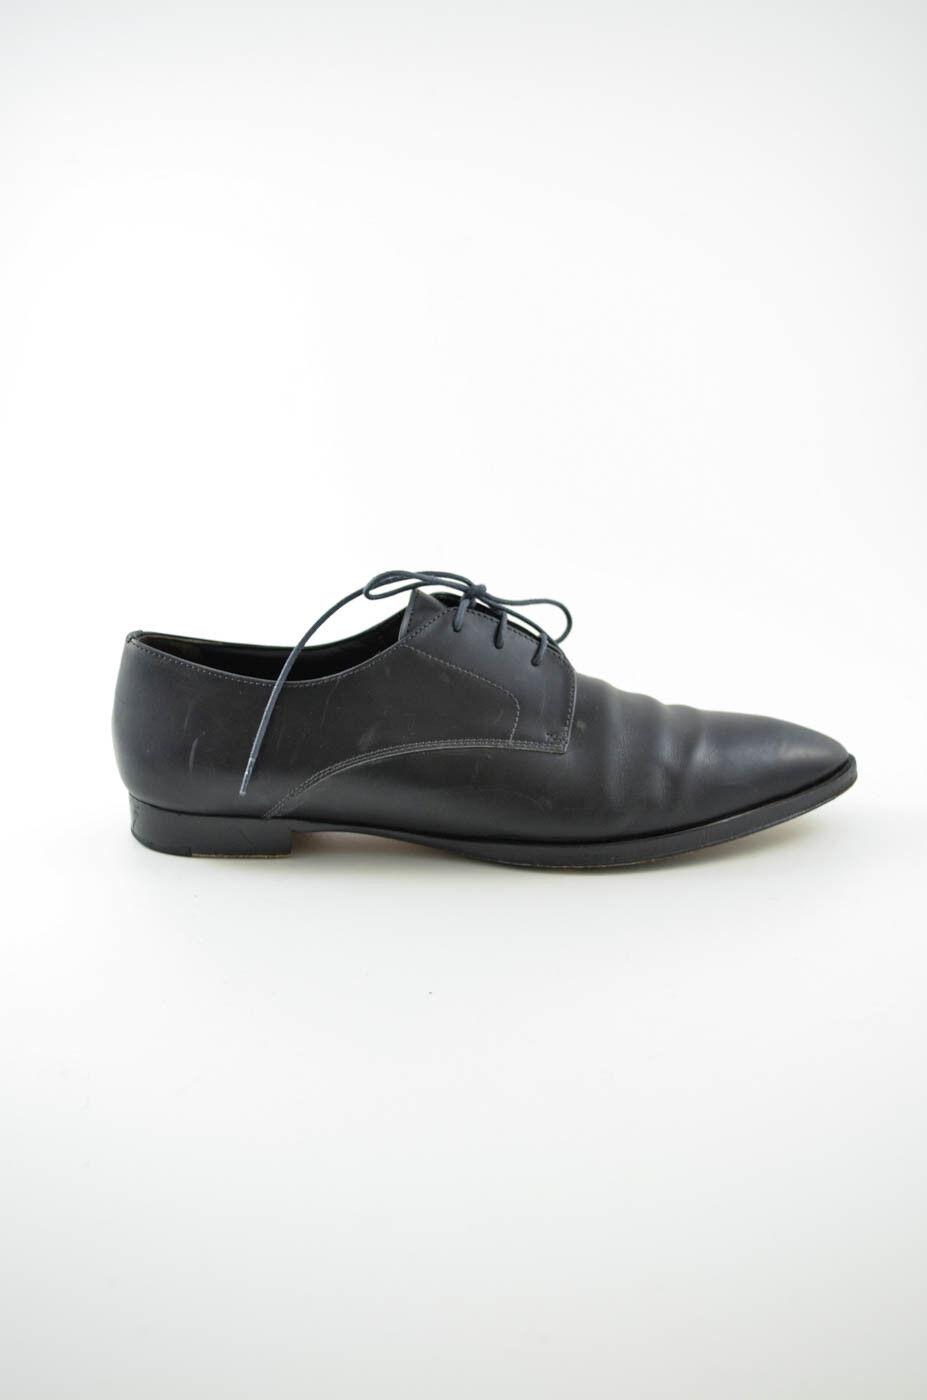 Jill Sander, mujer loafer, zapatos de cuero negro, talla 39,5.